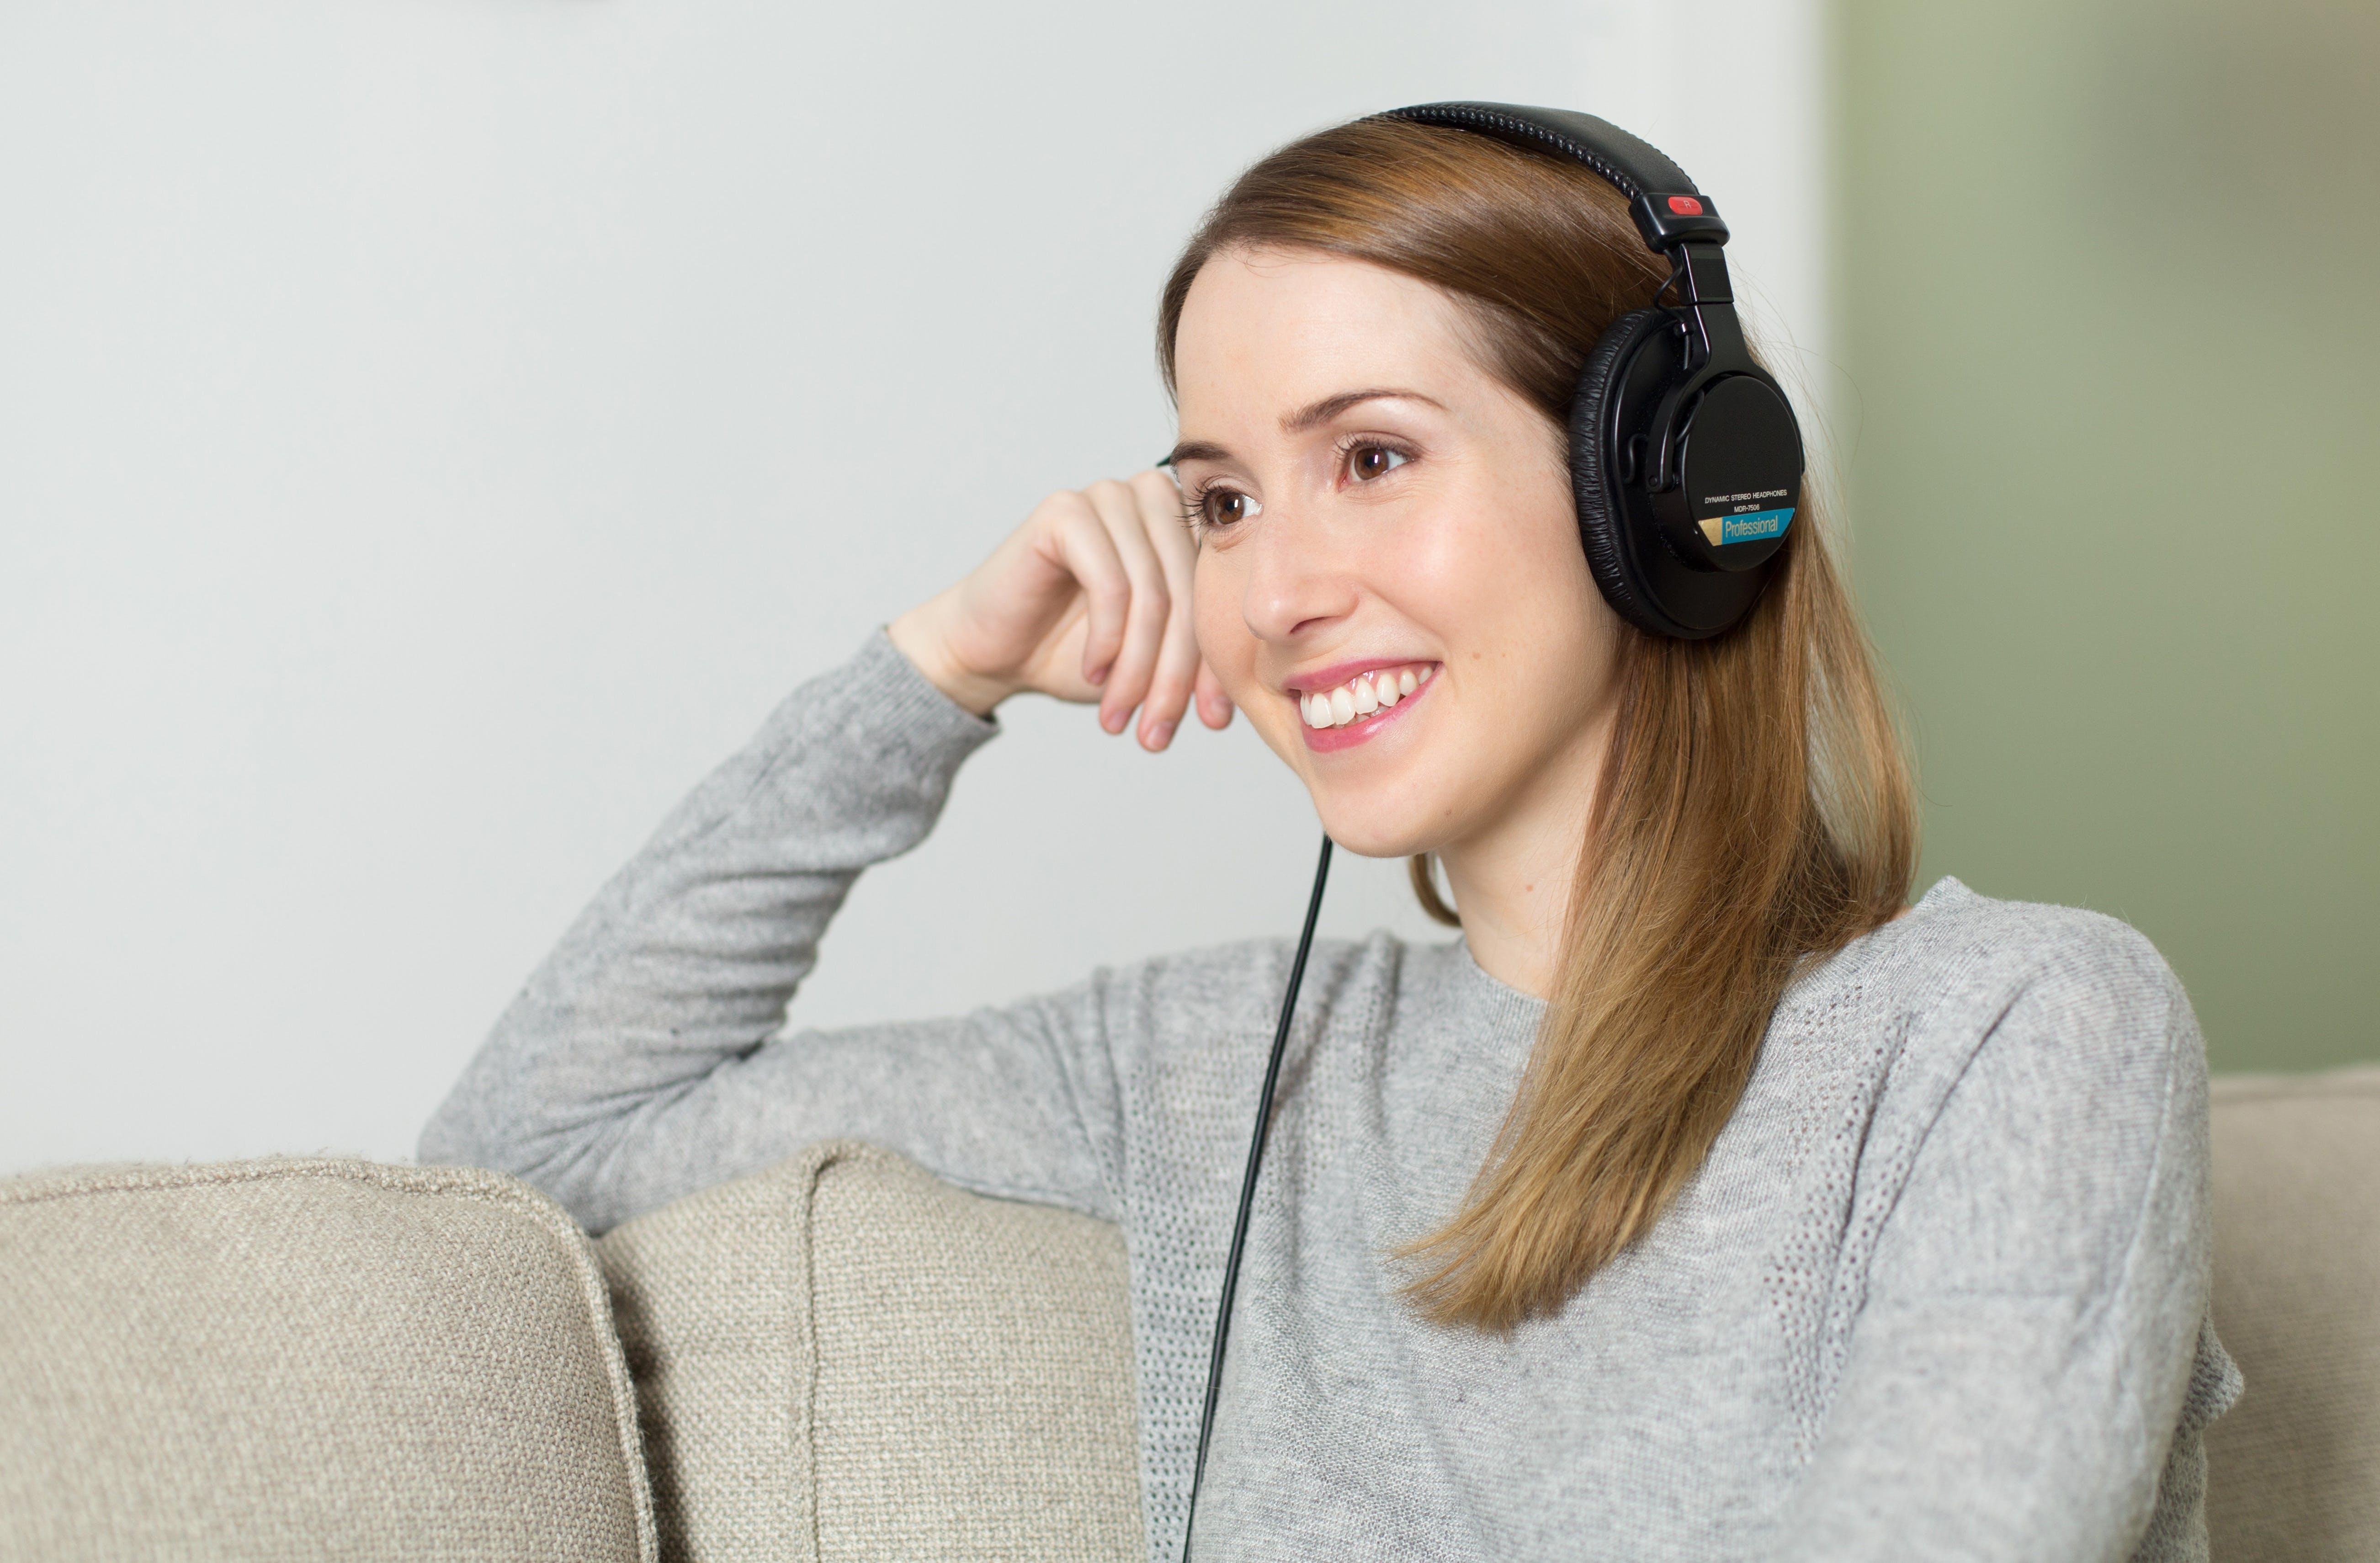 girl, headphones, headset